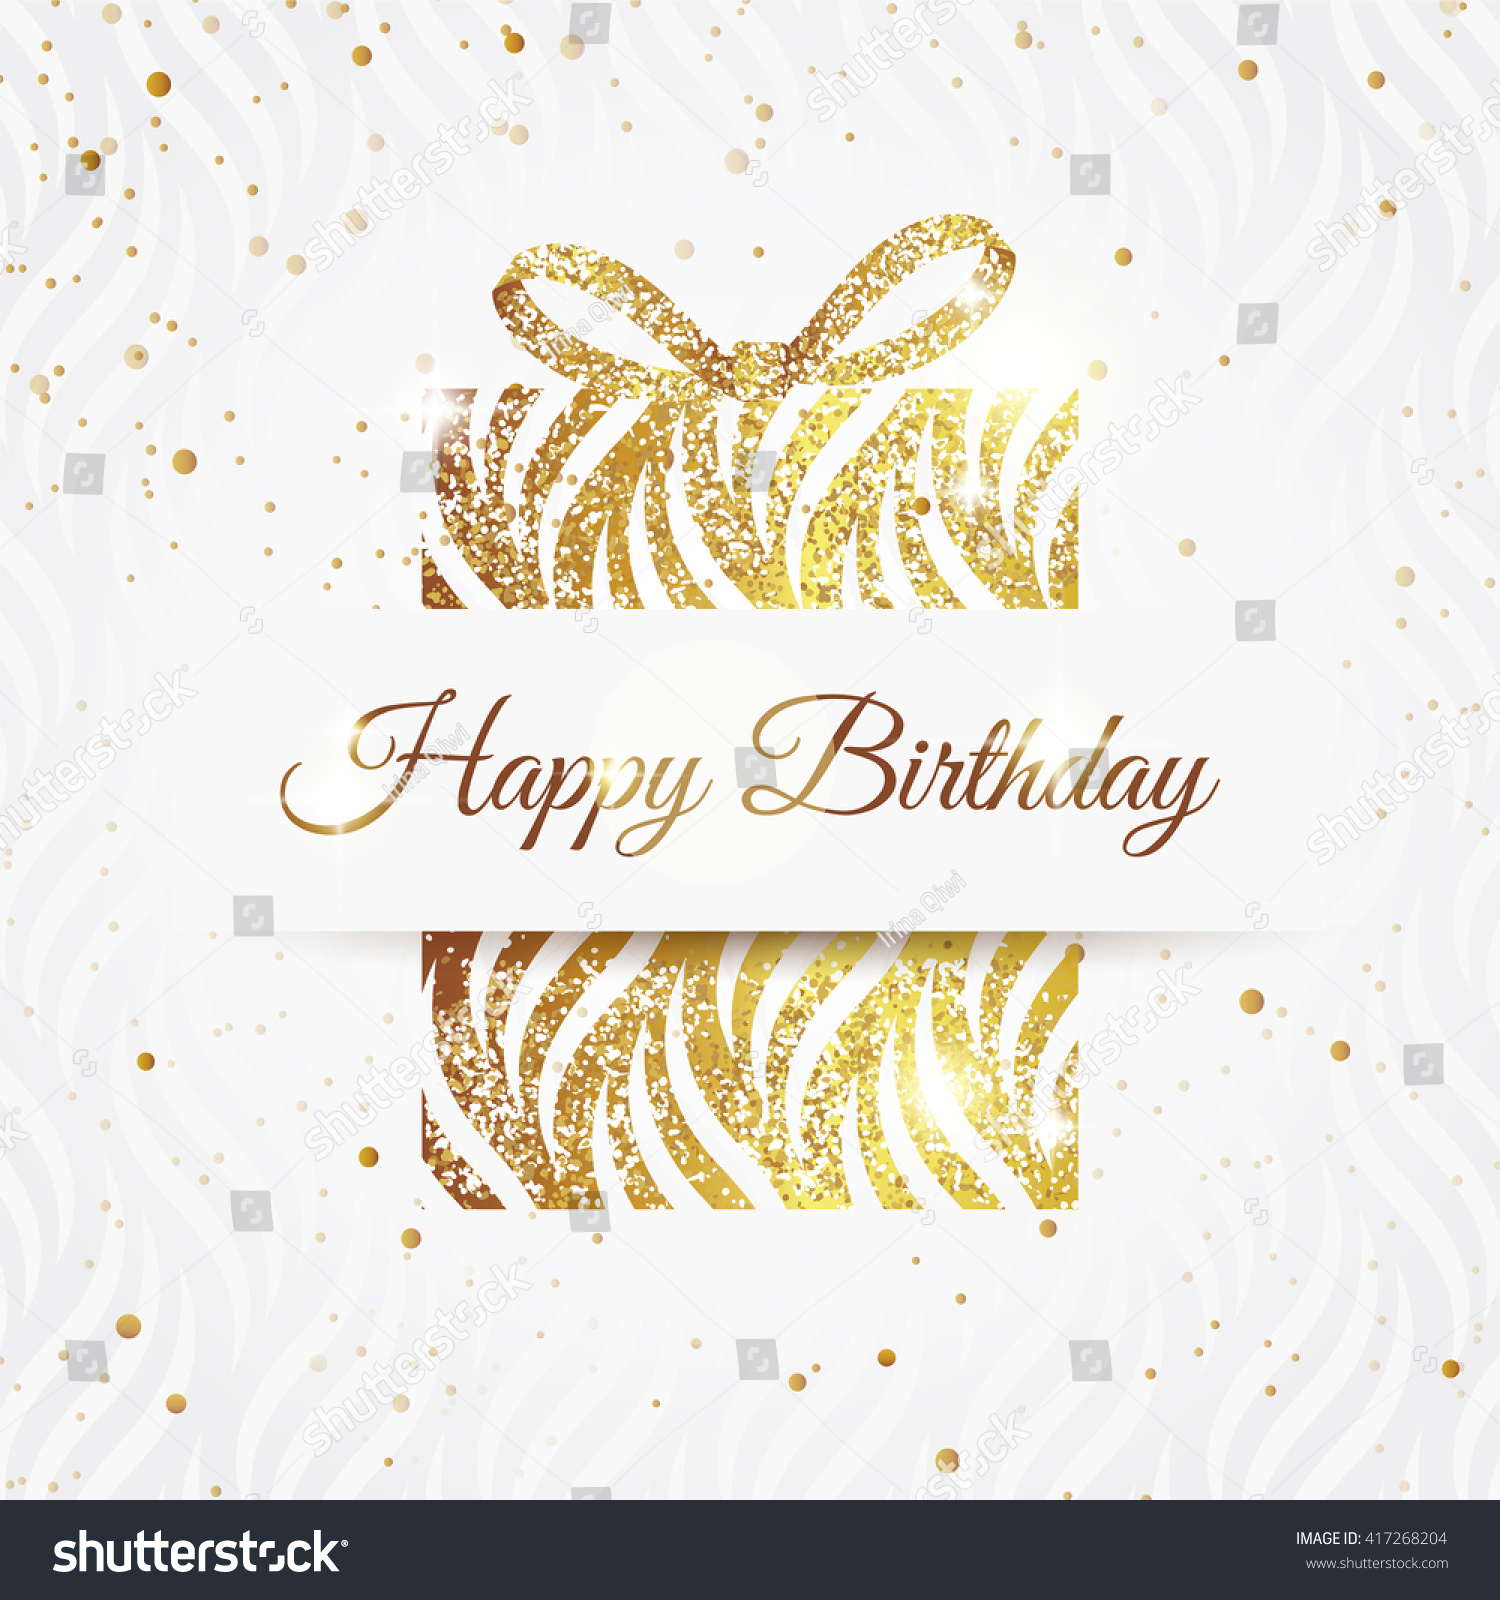 Happy Birthday Elegant Card Golden Gift Stock Vector Royalty Free